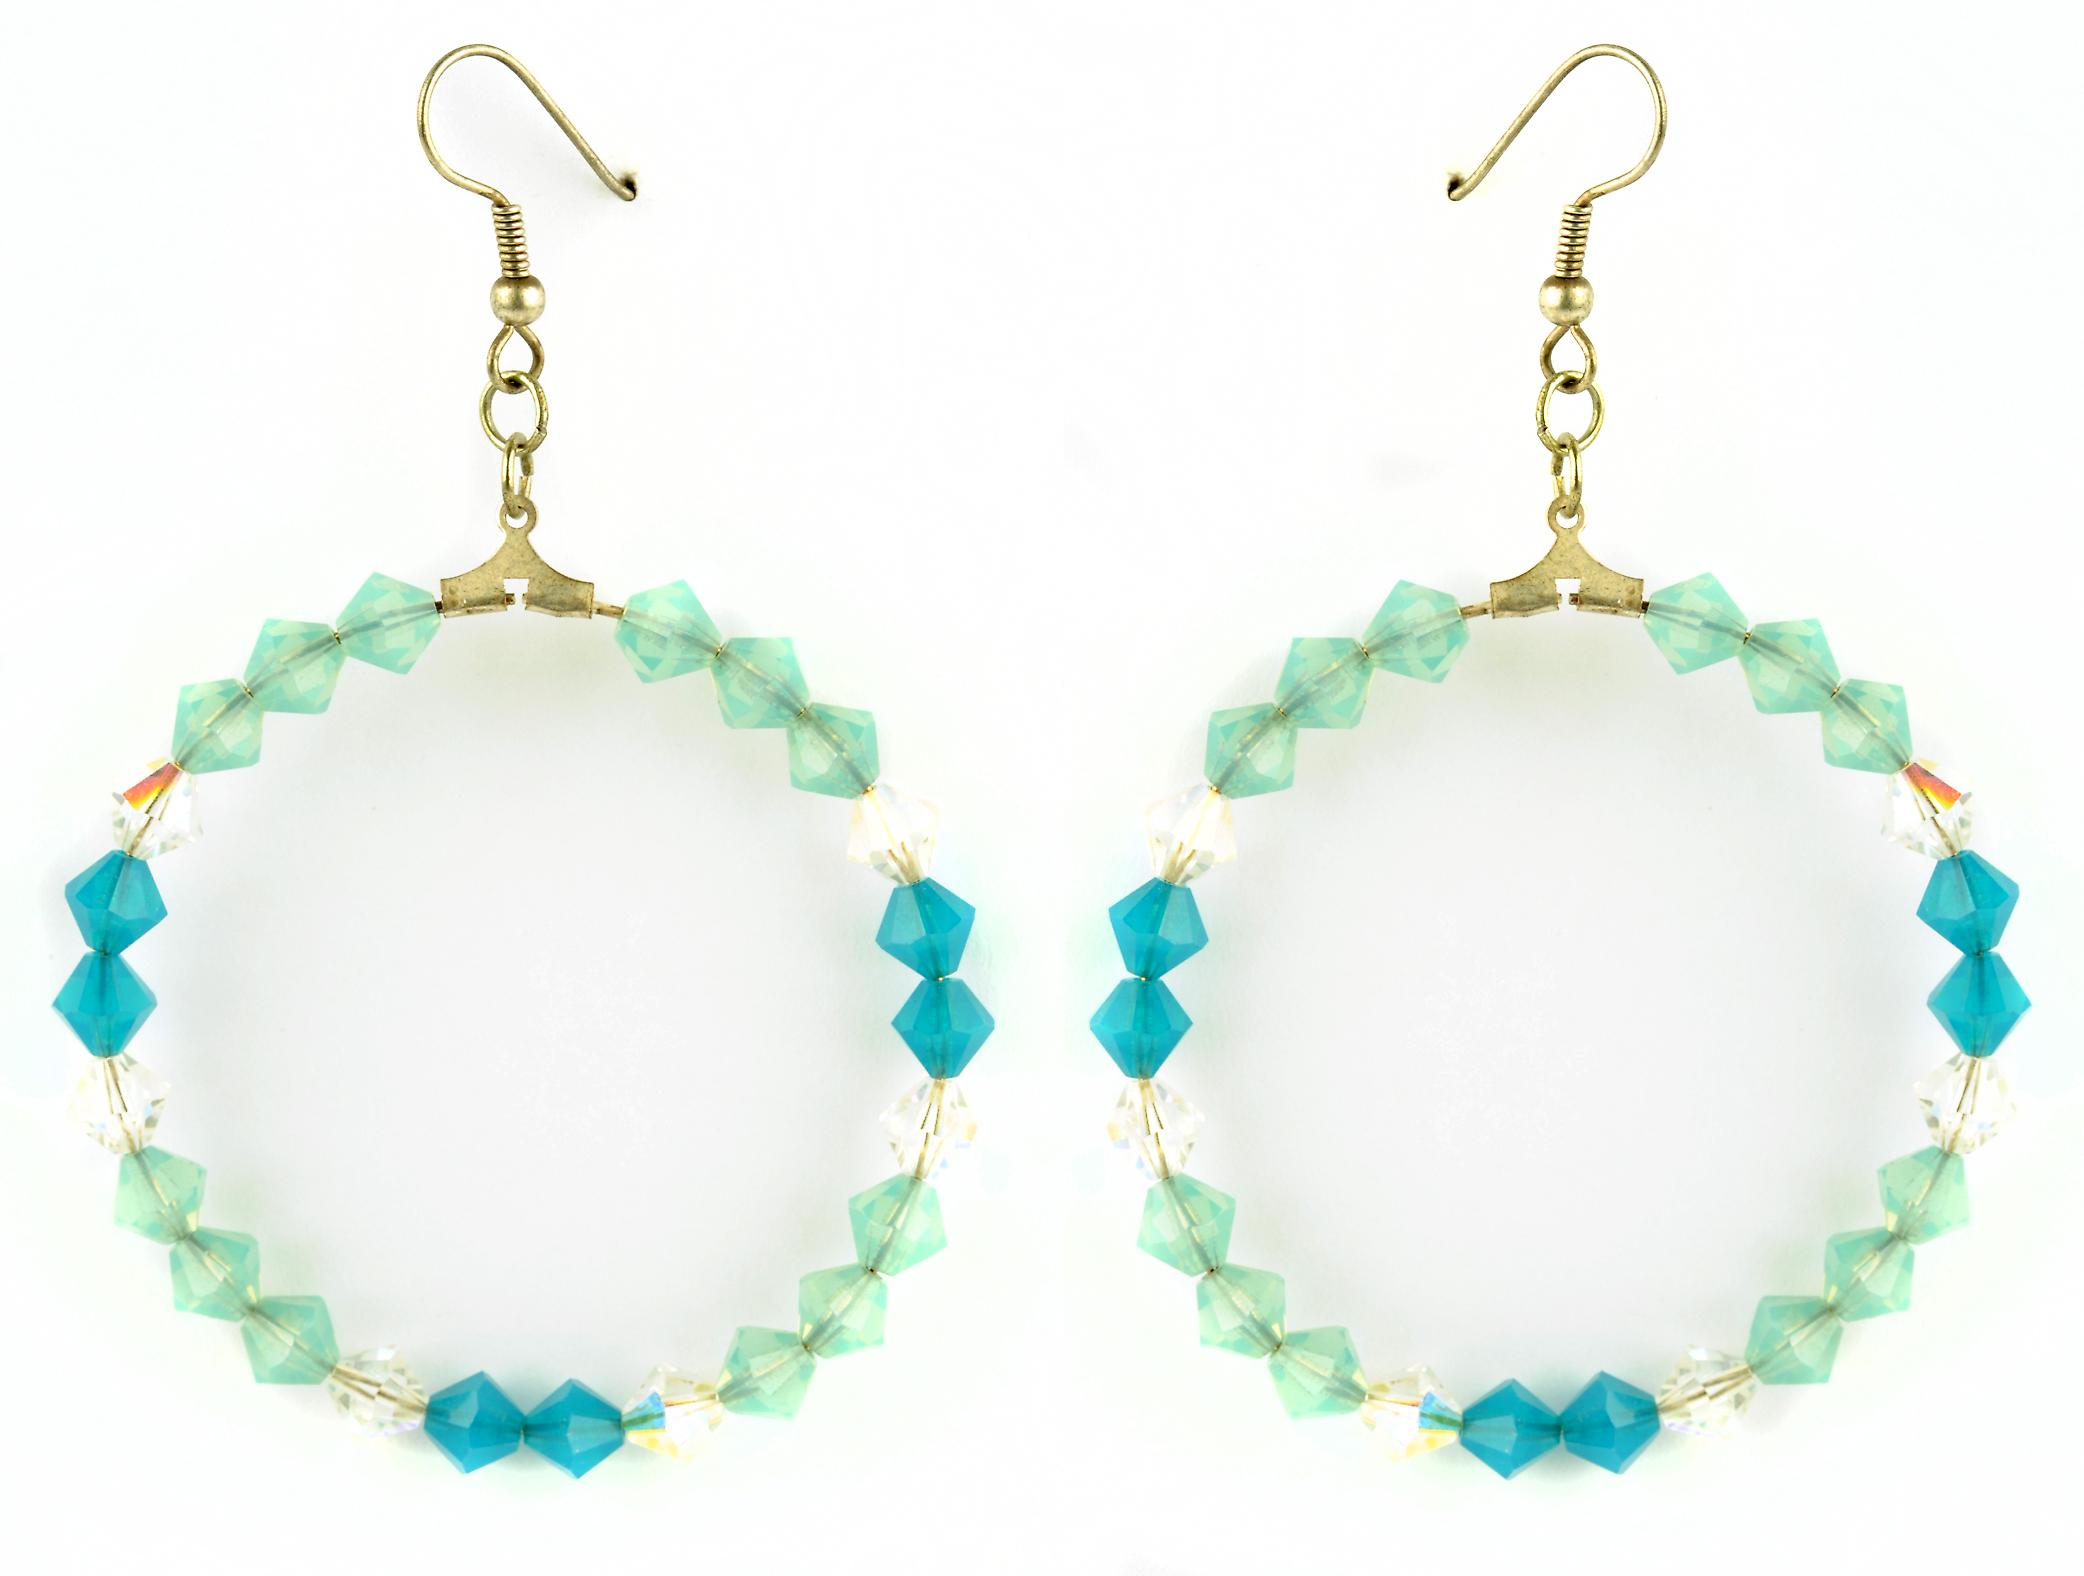 Waooh - Bijoux Fantaisie - WJ0764 - Boucles D'Oreille Style Créole avec Strass Swarovski Bleu Blanc Vert